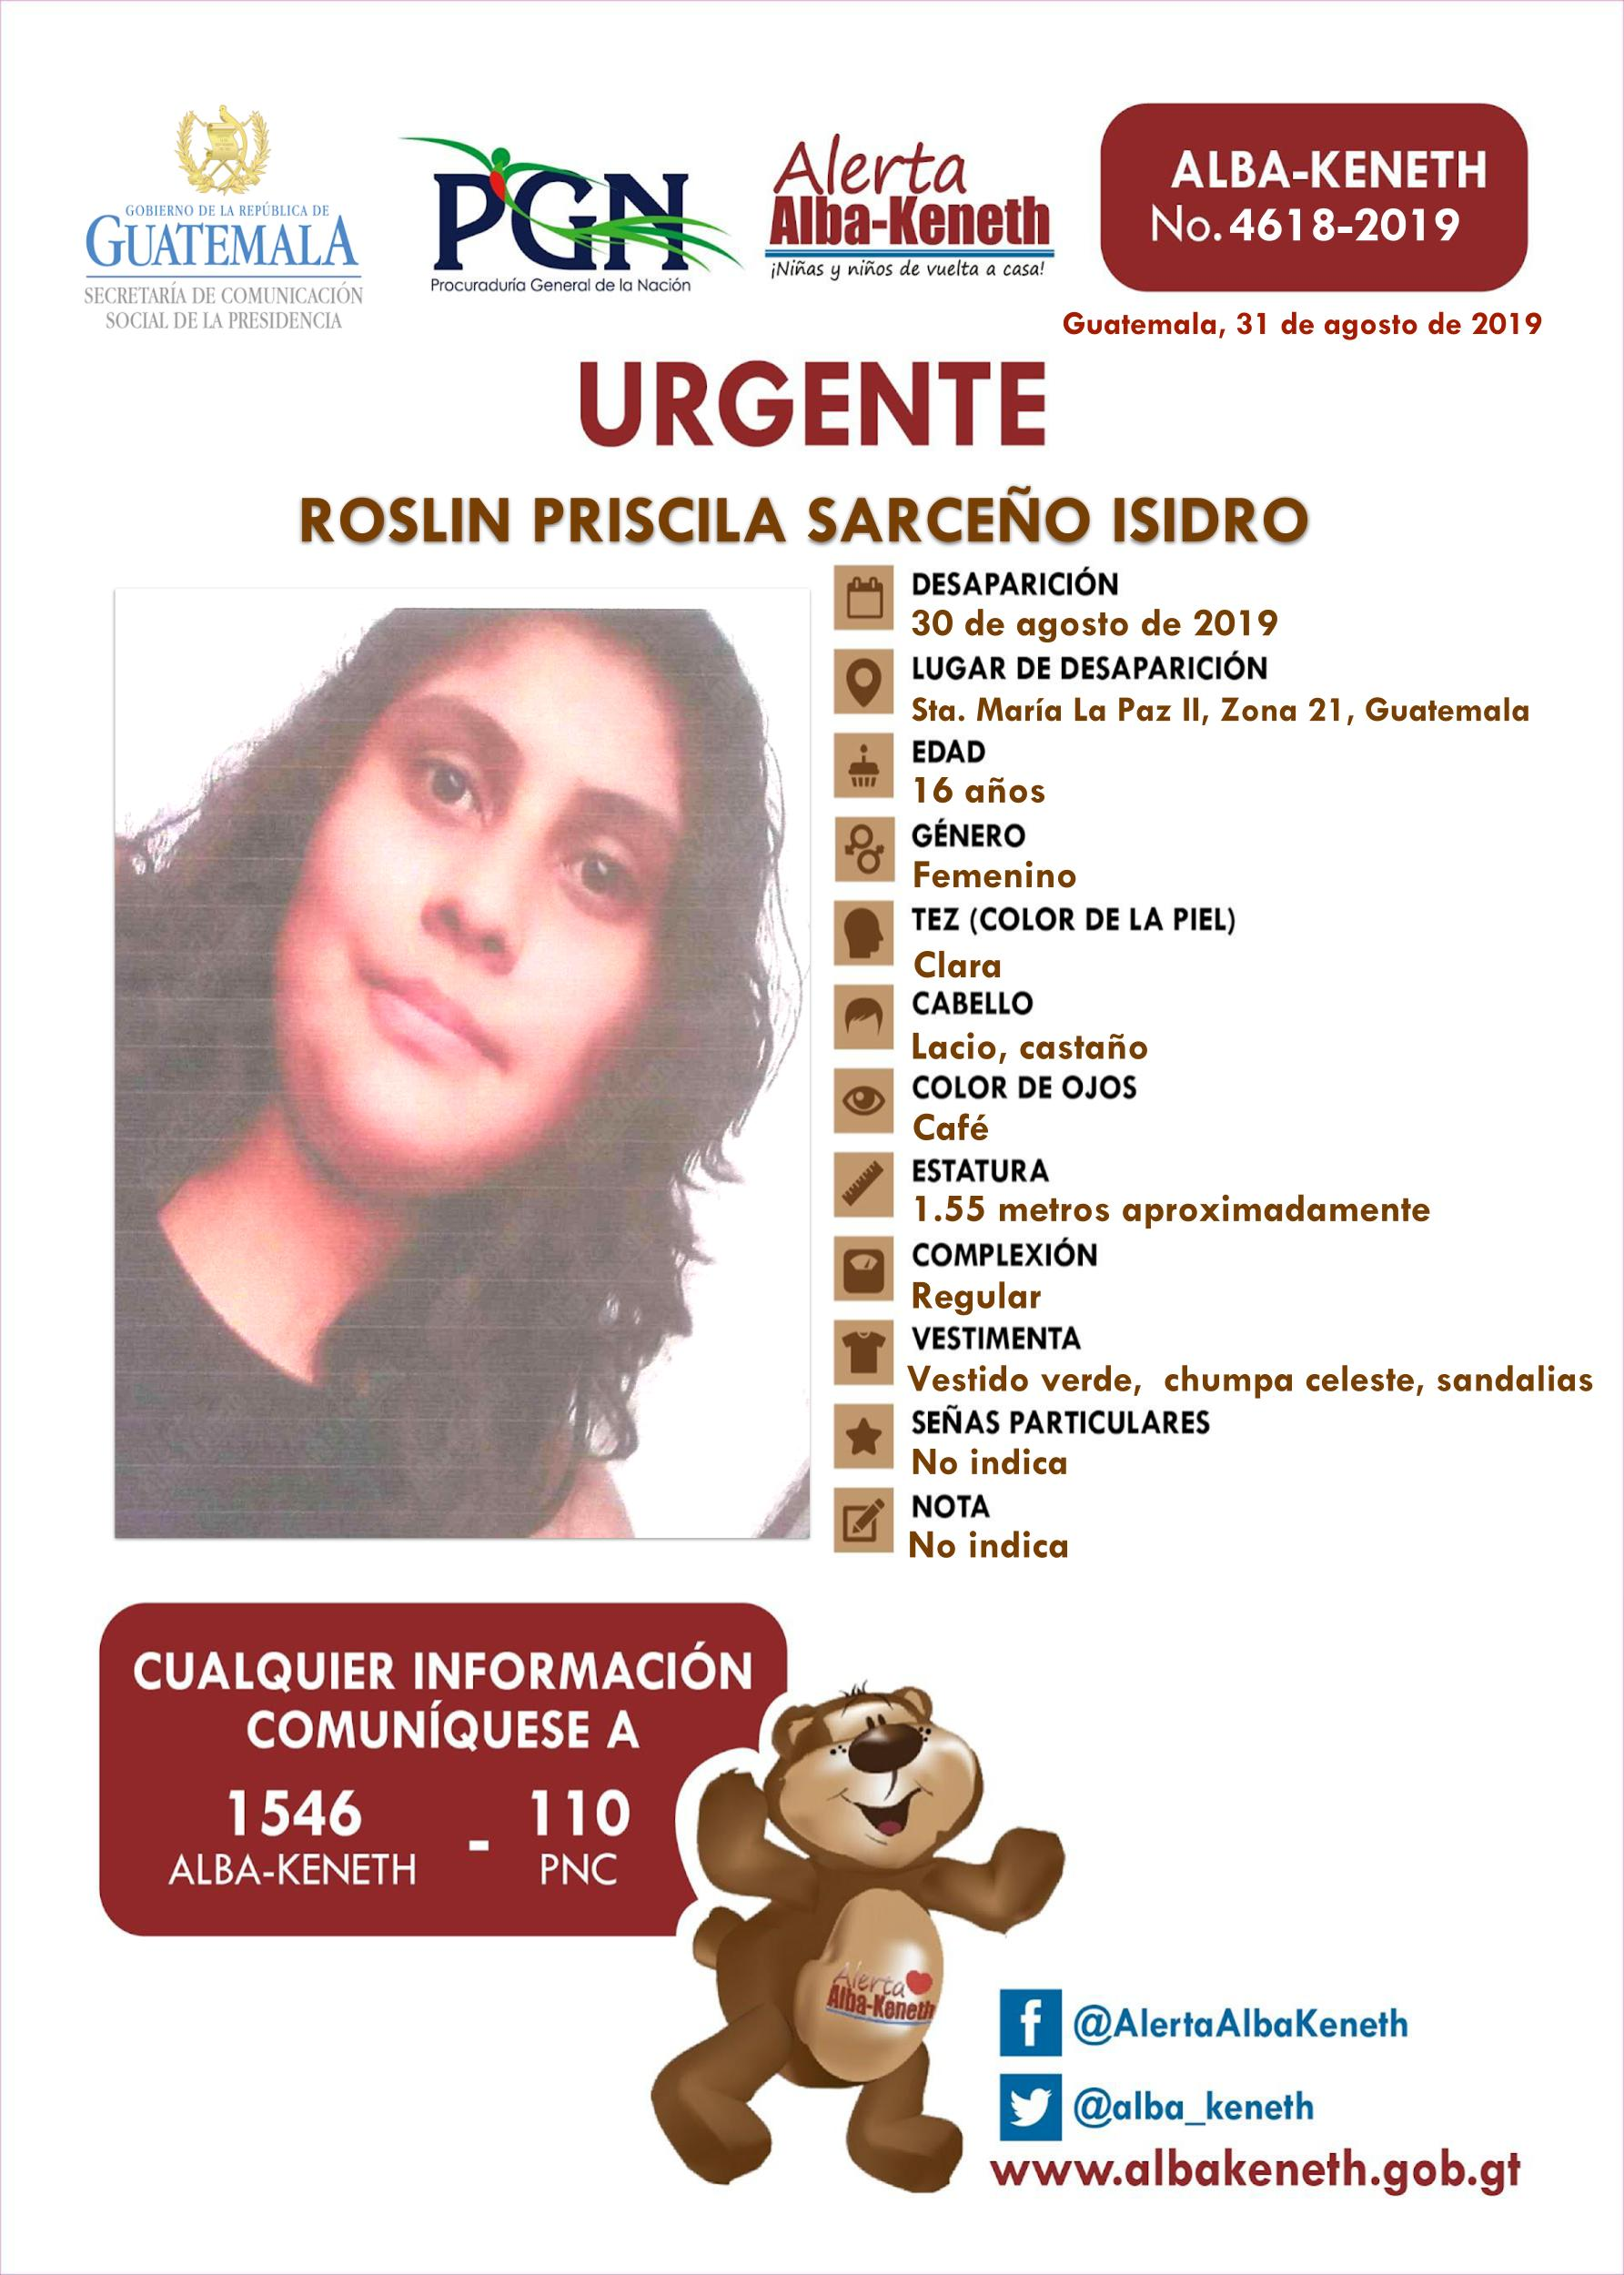 Roslin Priscila Sarceño Isidro